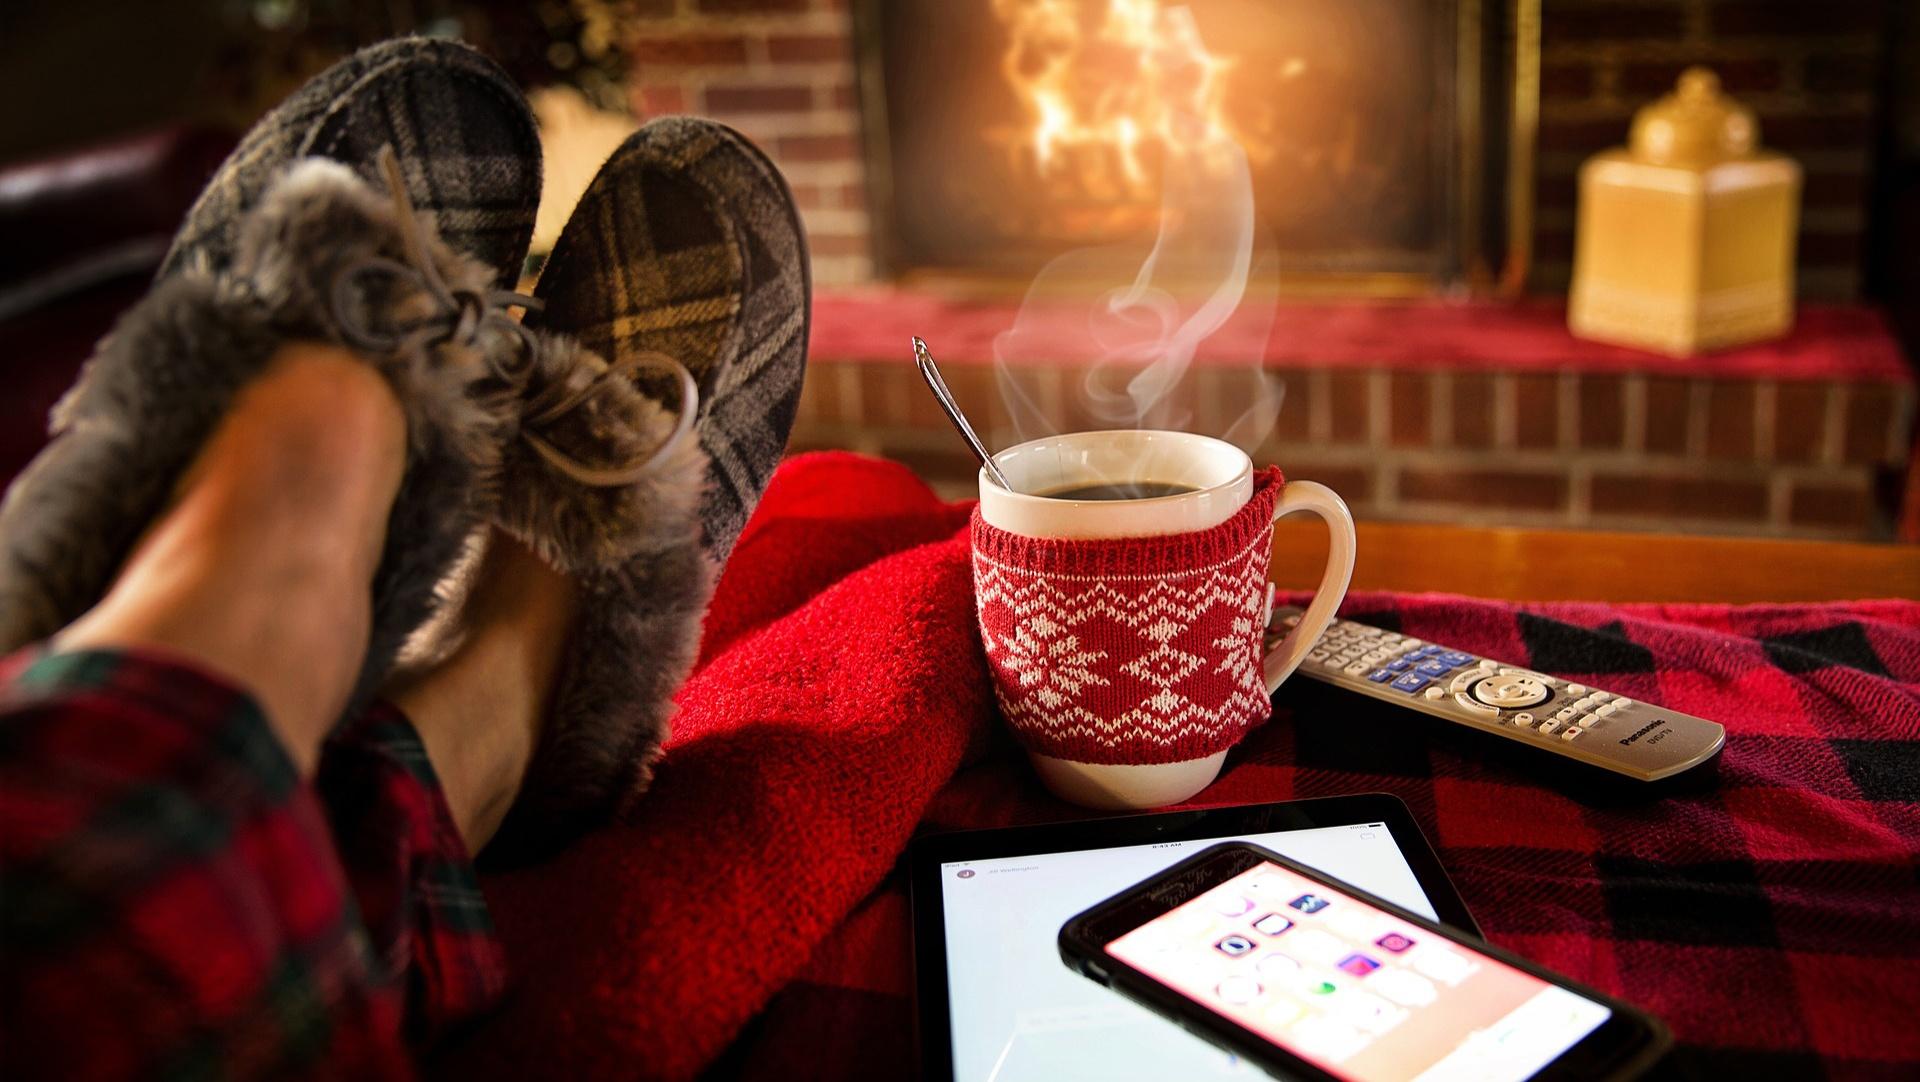 hot chocolate and work